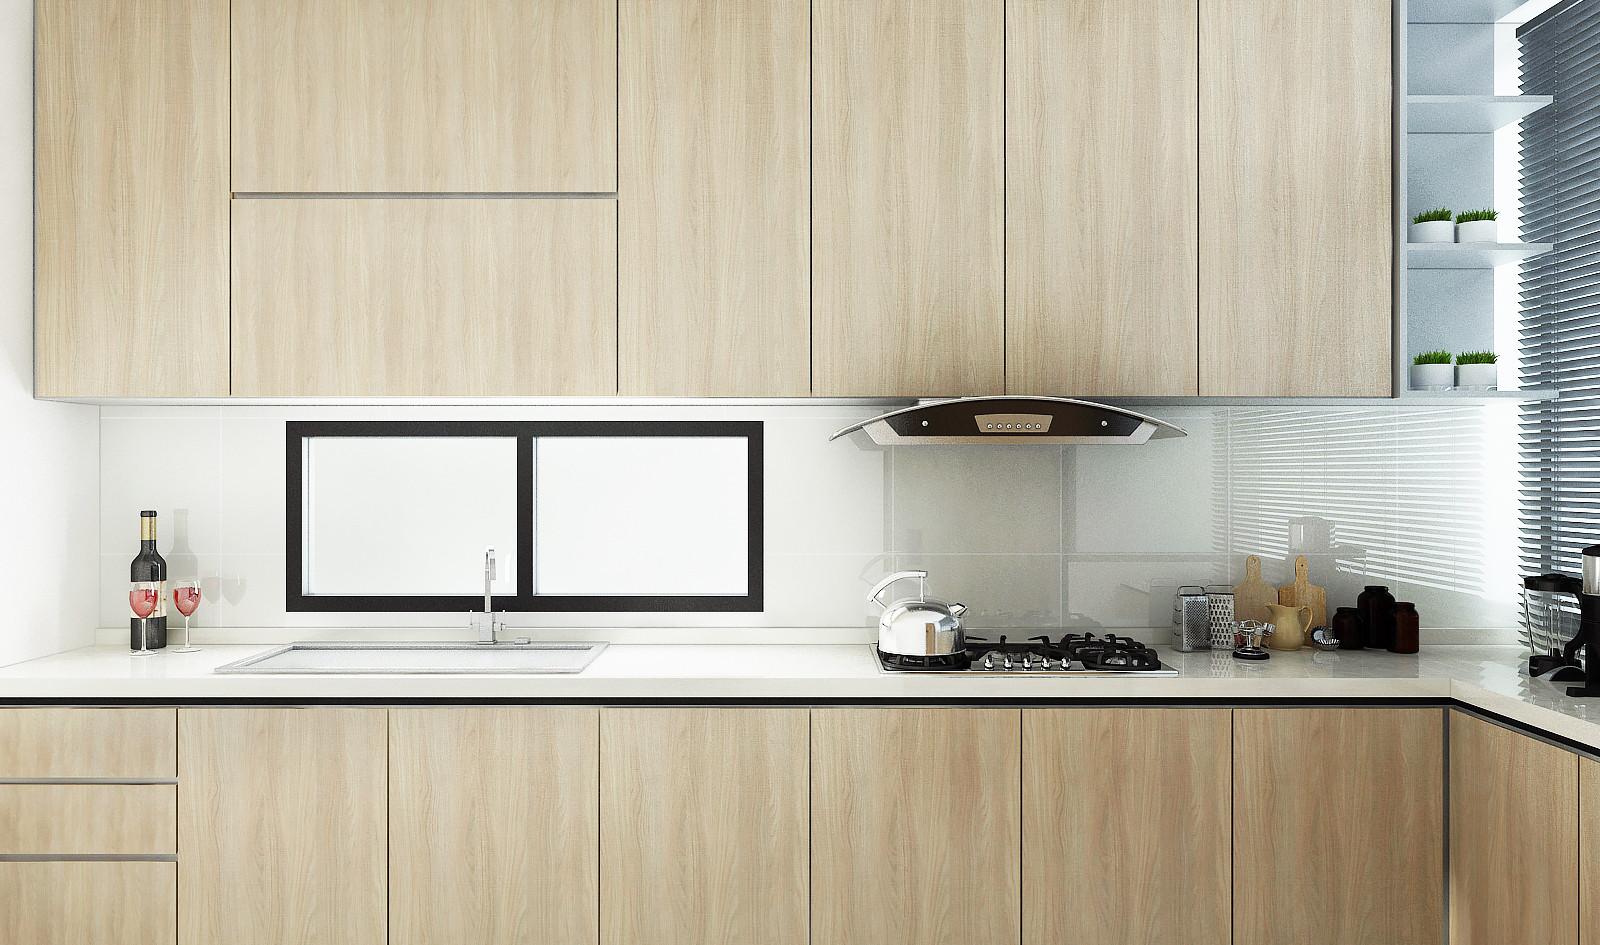 339_55JAL_Kitchen_V1.jpg